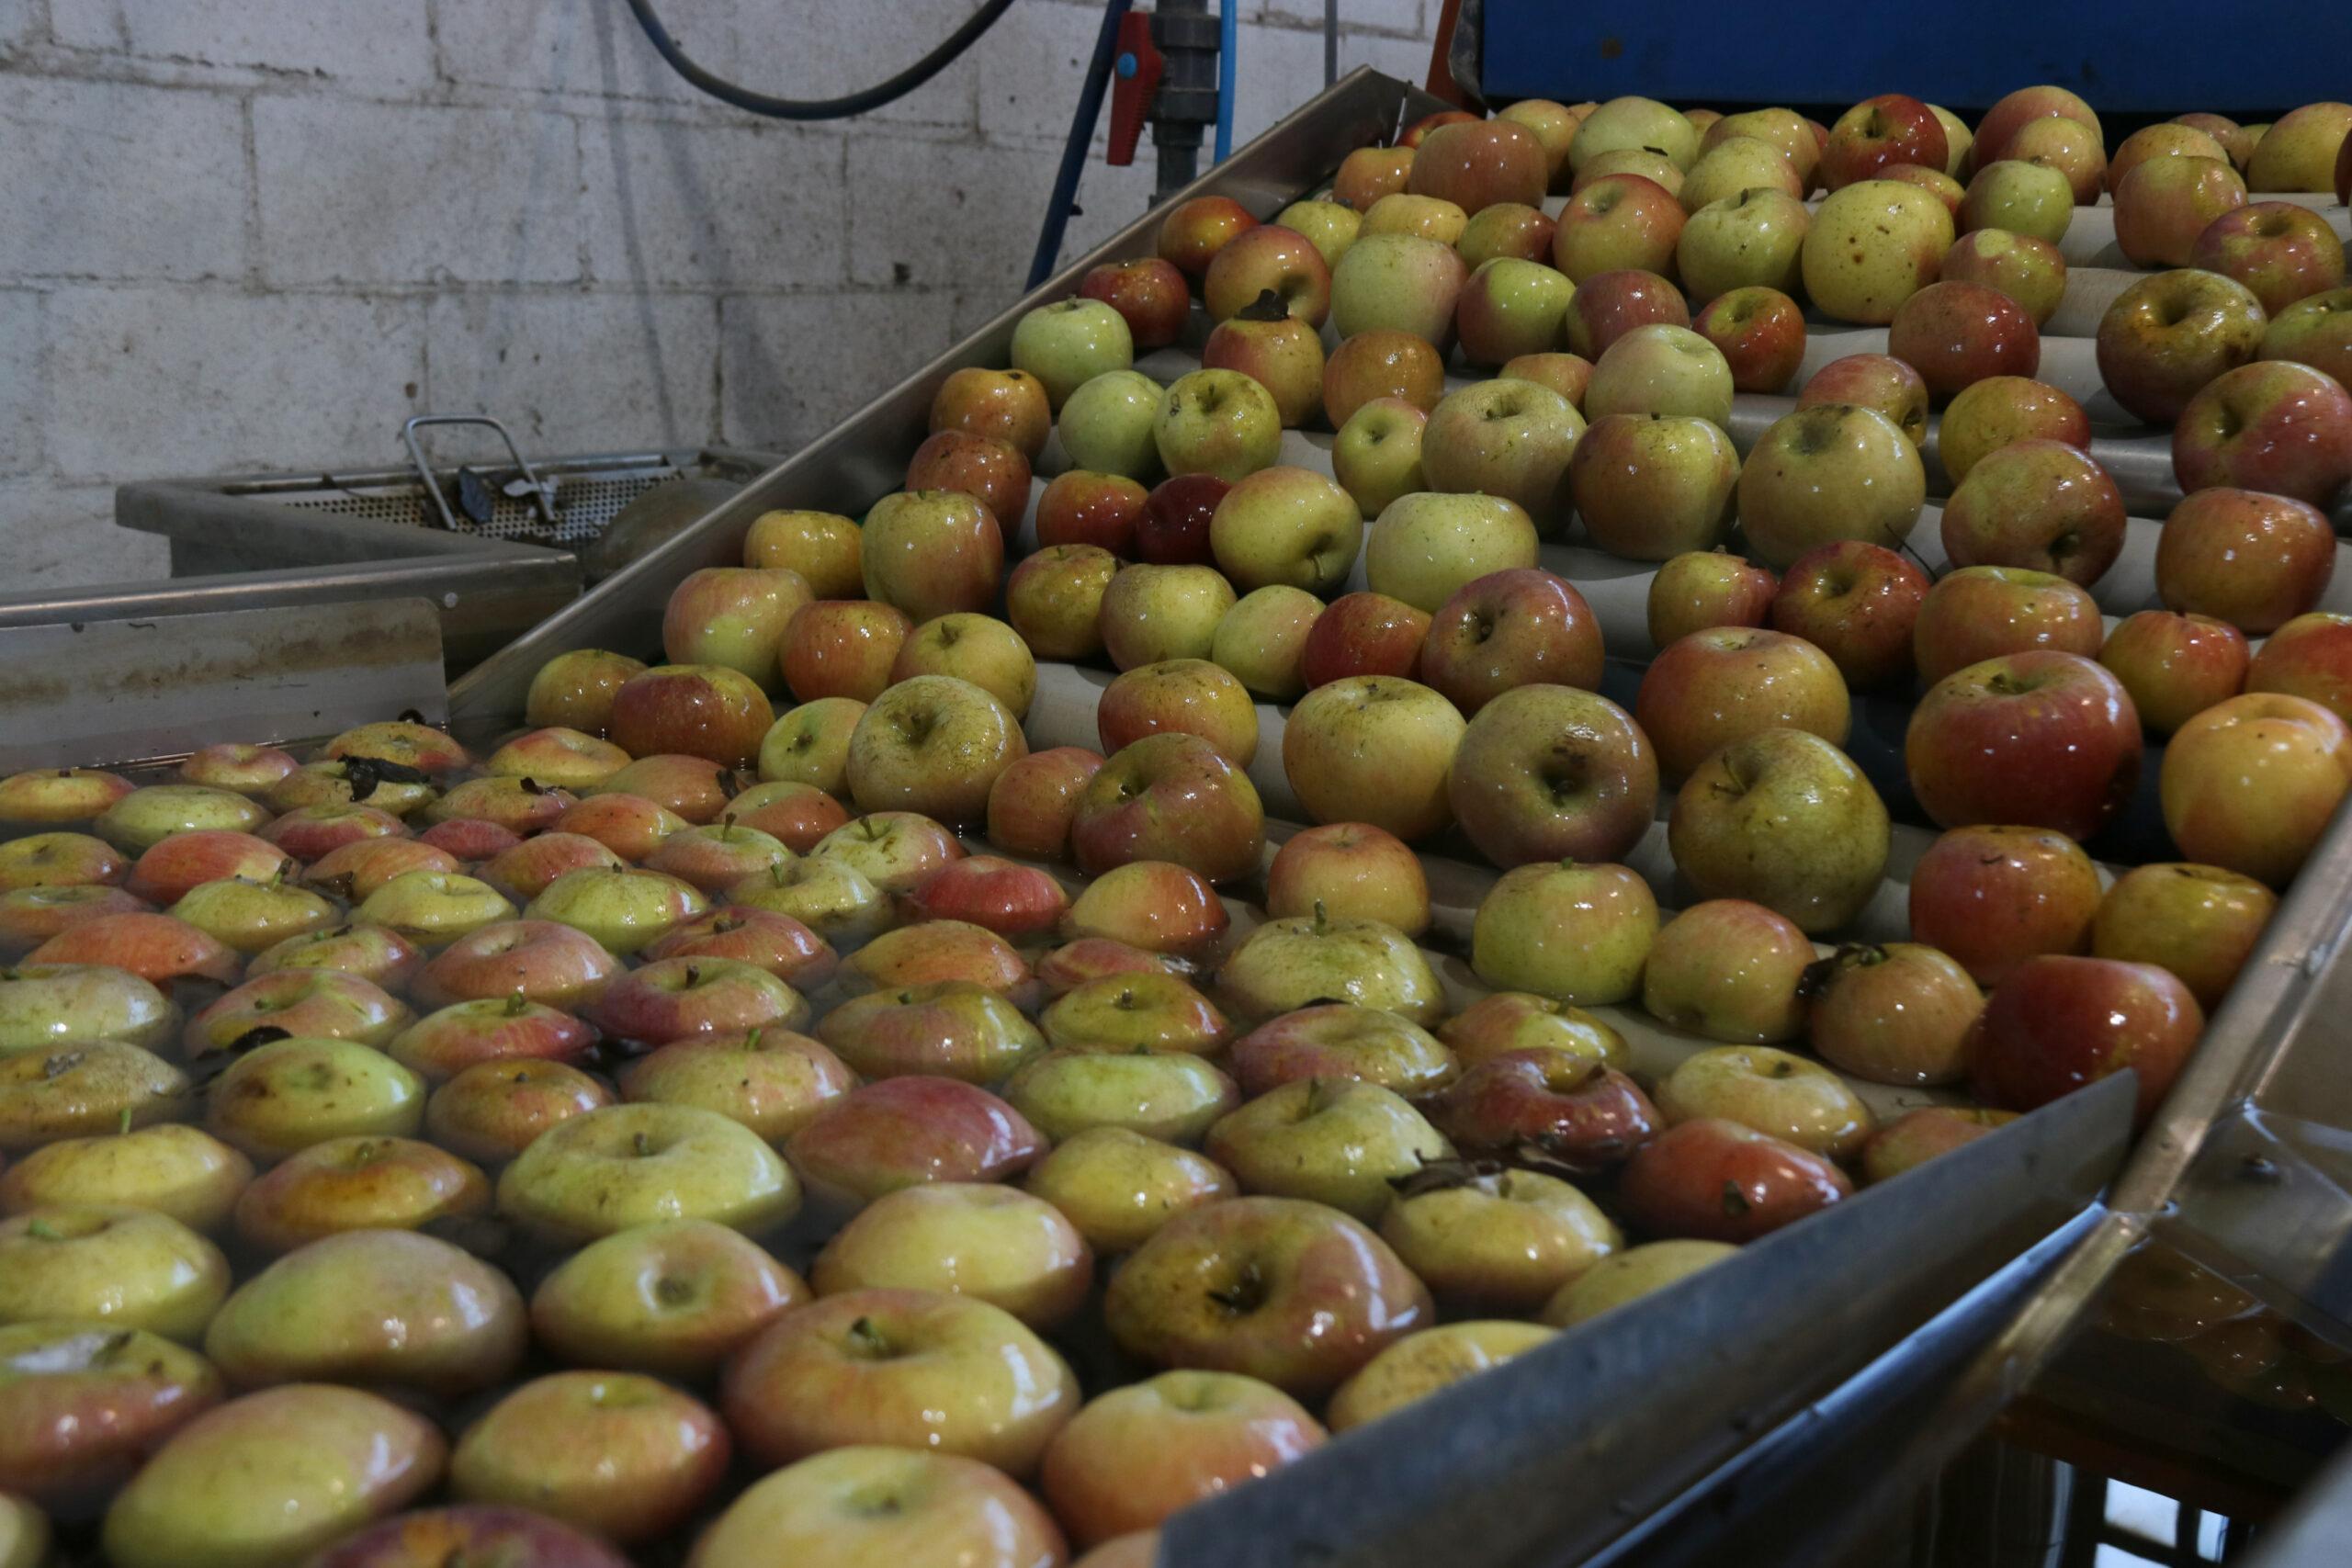 Nombroses pomes   ACN